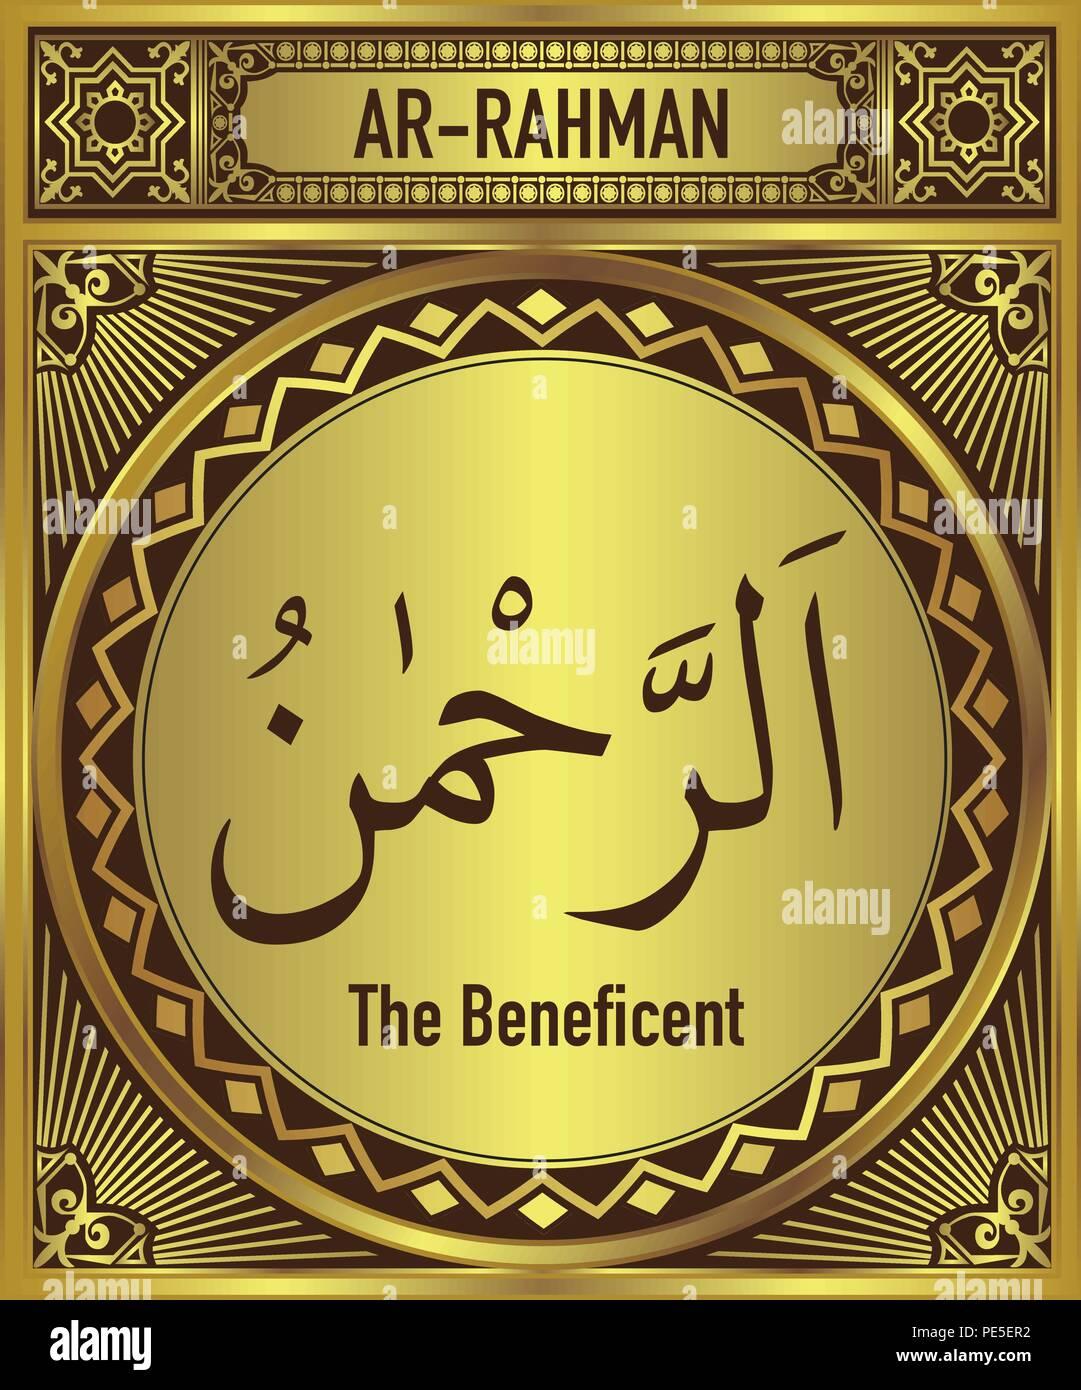 99 Beautiful Names of Allah English Translate below the Arabic calligraphy - Stock Vector